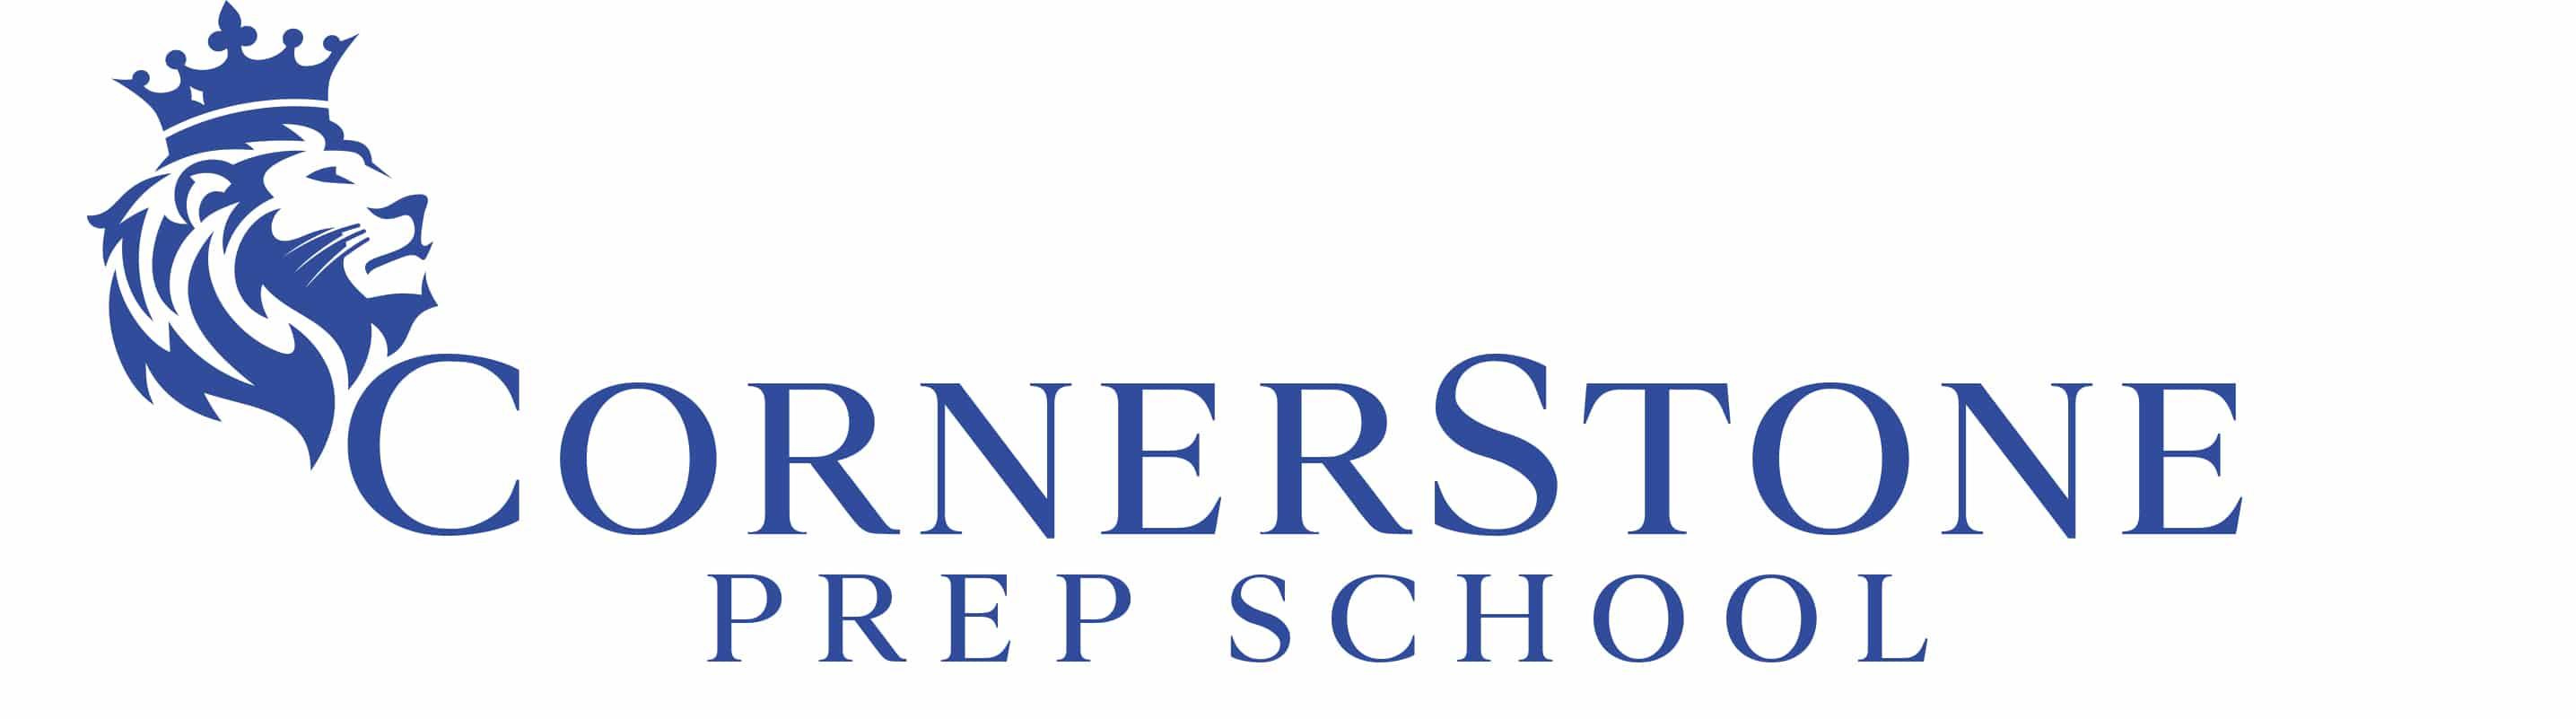 Cornerstone Prep School